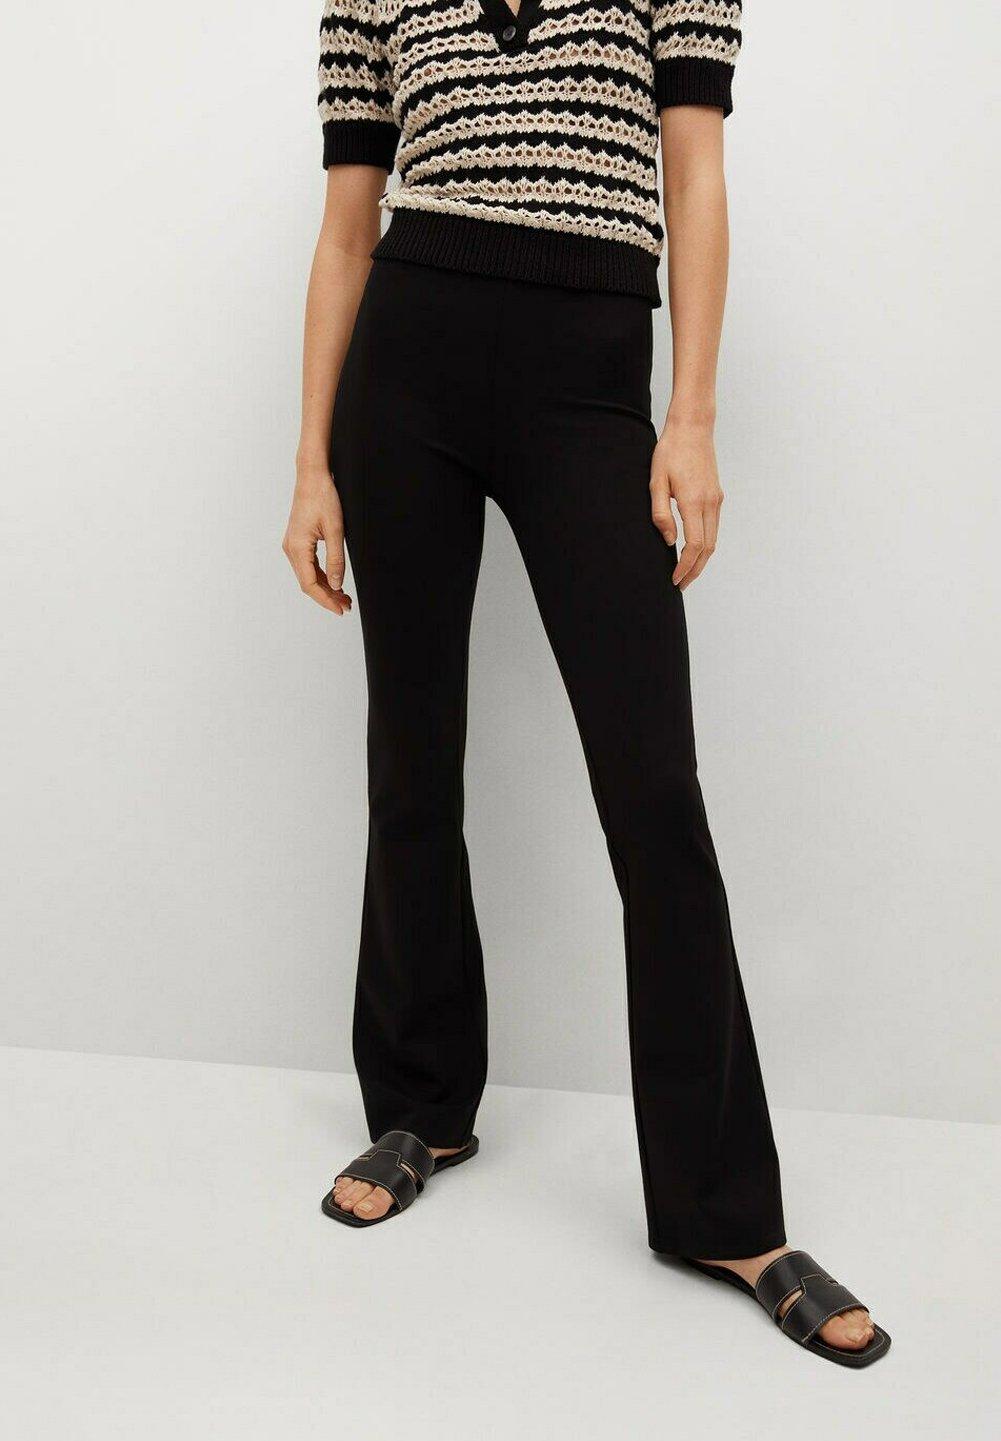 Women PUNTAF-A - Leggings - Trousers